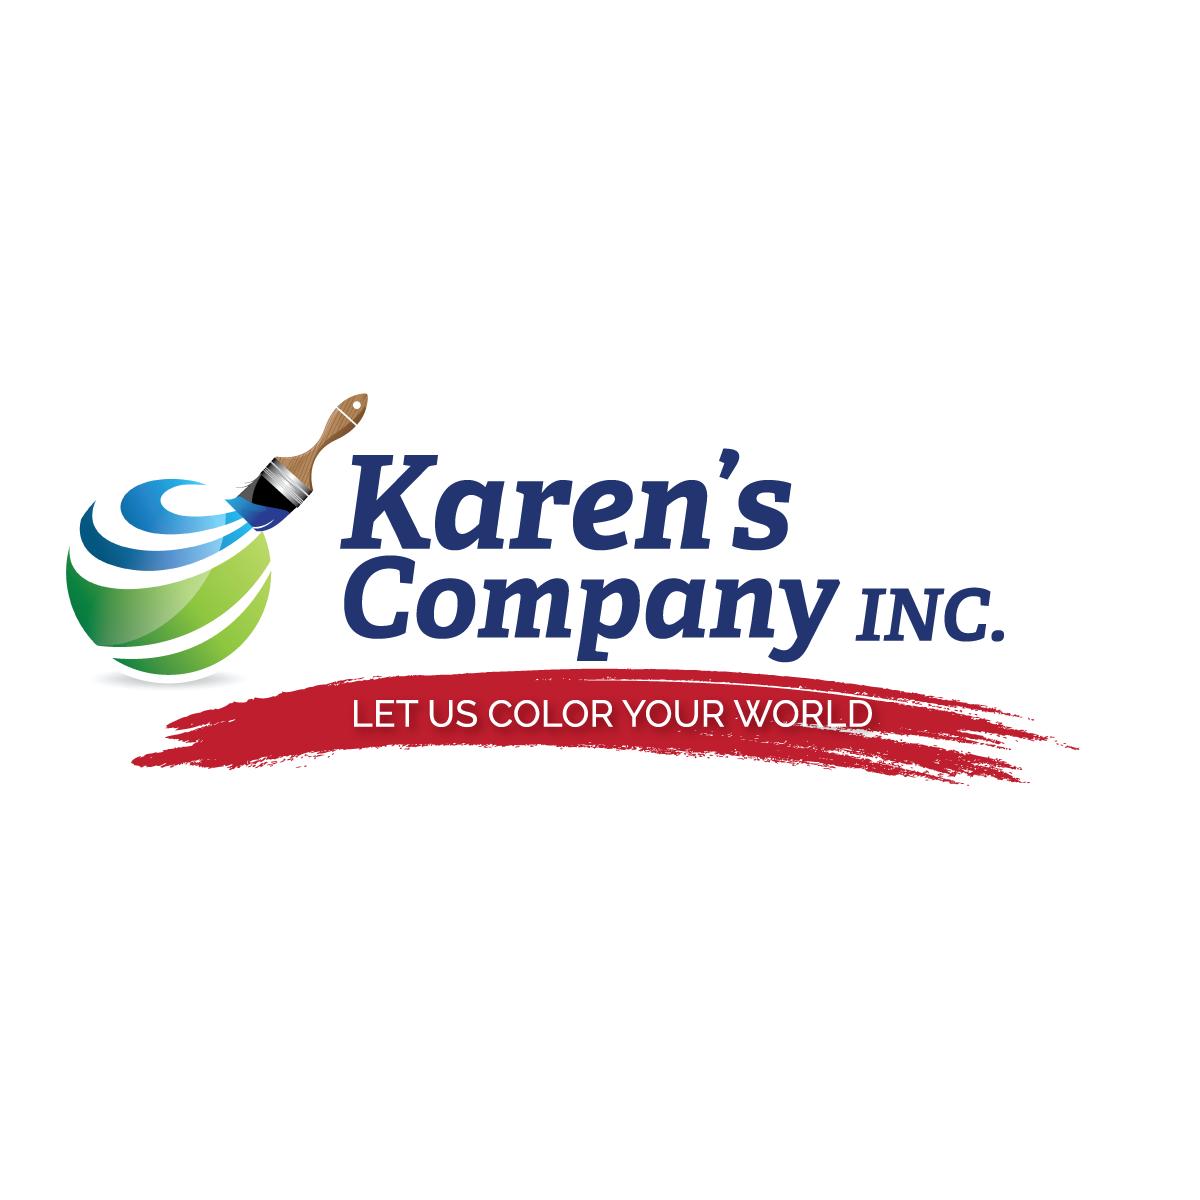 Karen's Company Inc.